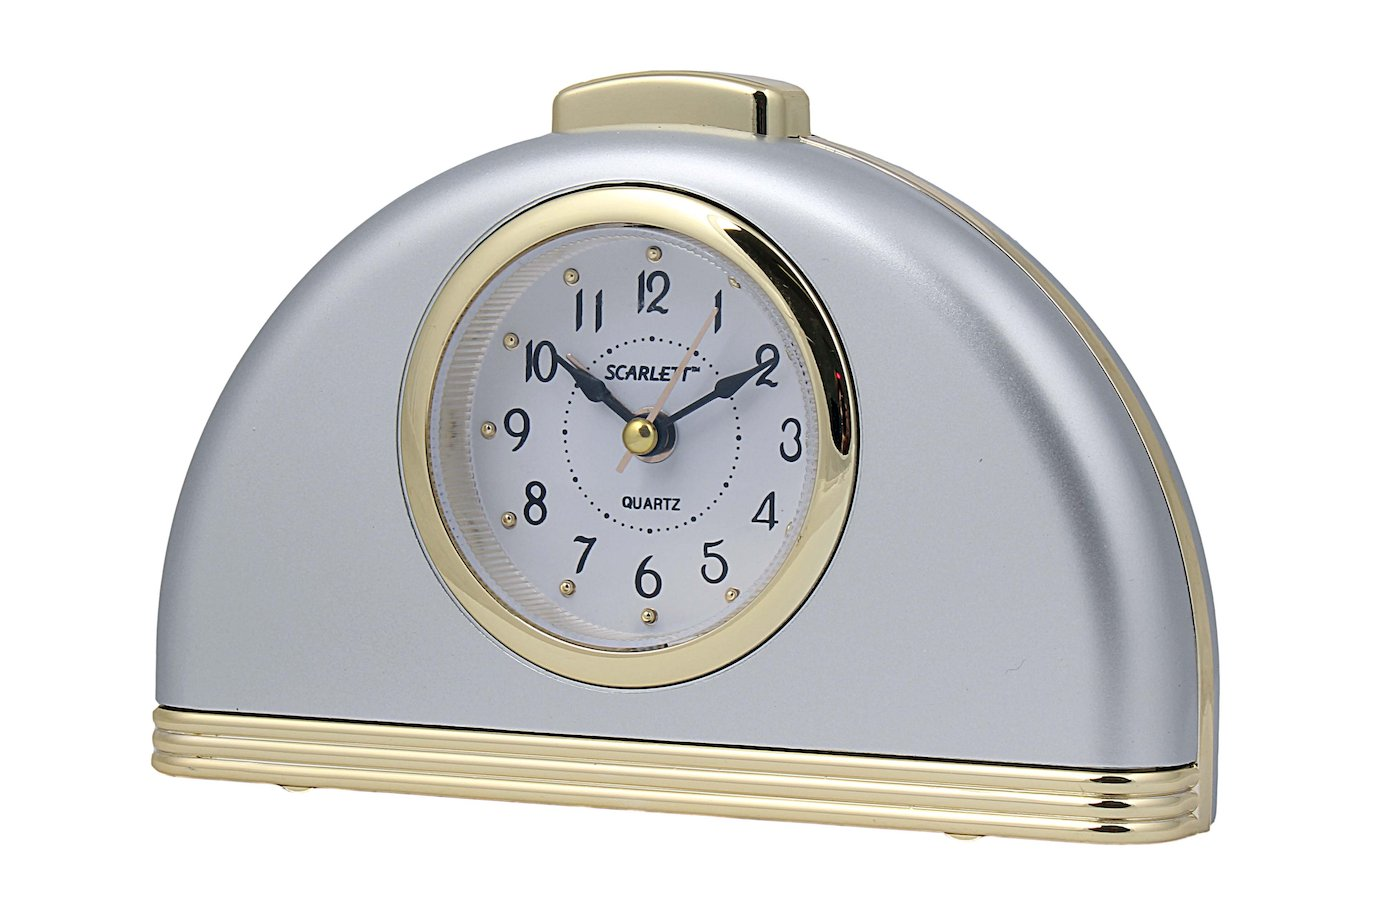 Будильник Scarlett 832 будильник нарастающий сигнал подсветка